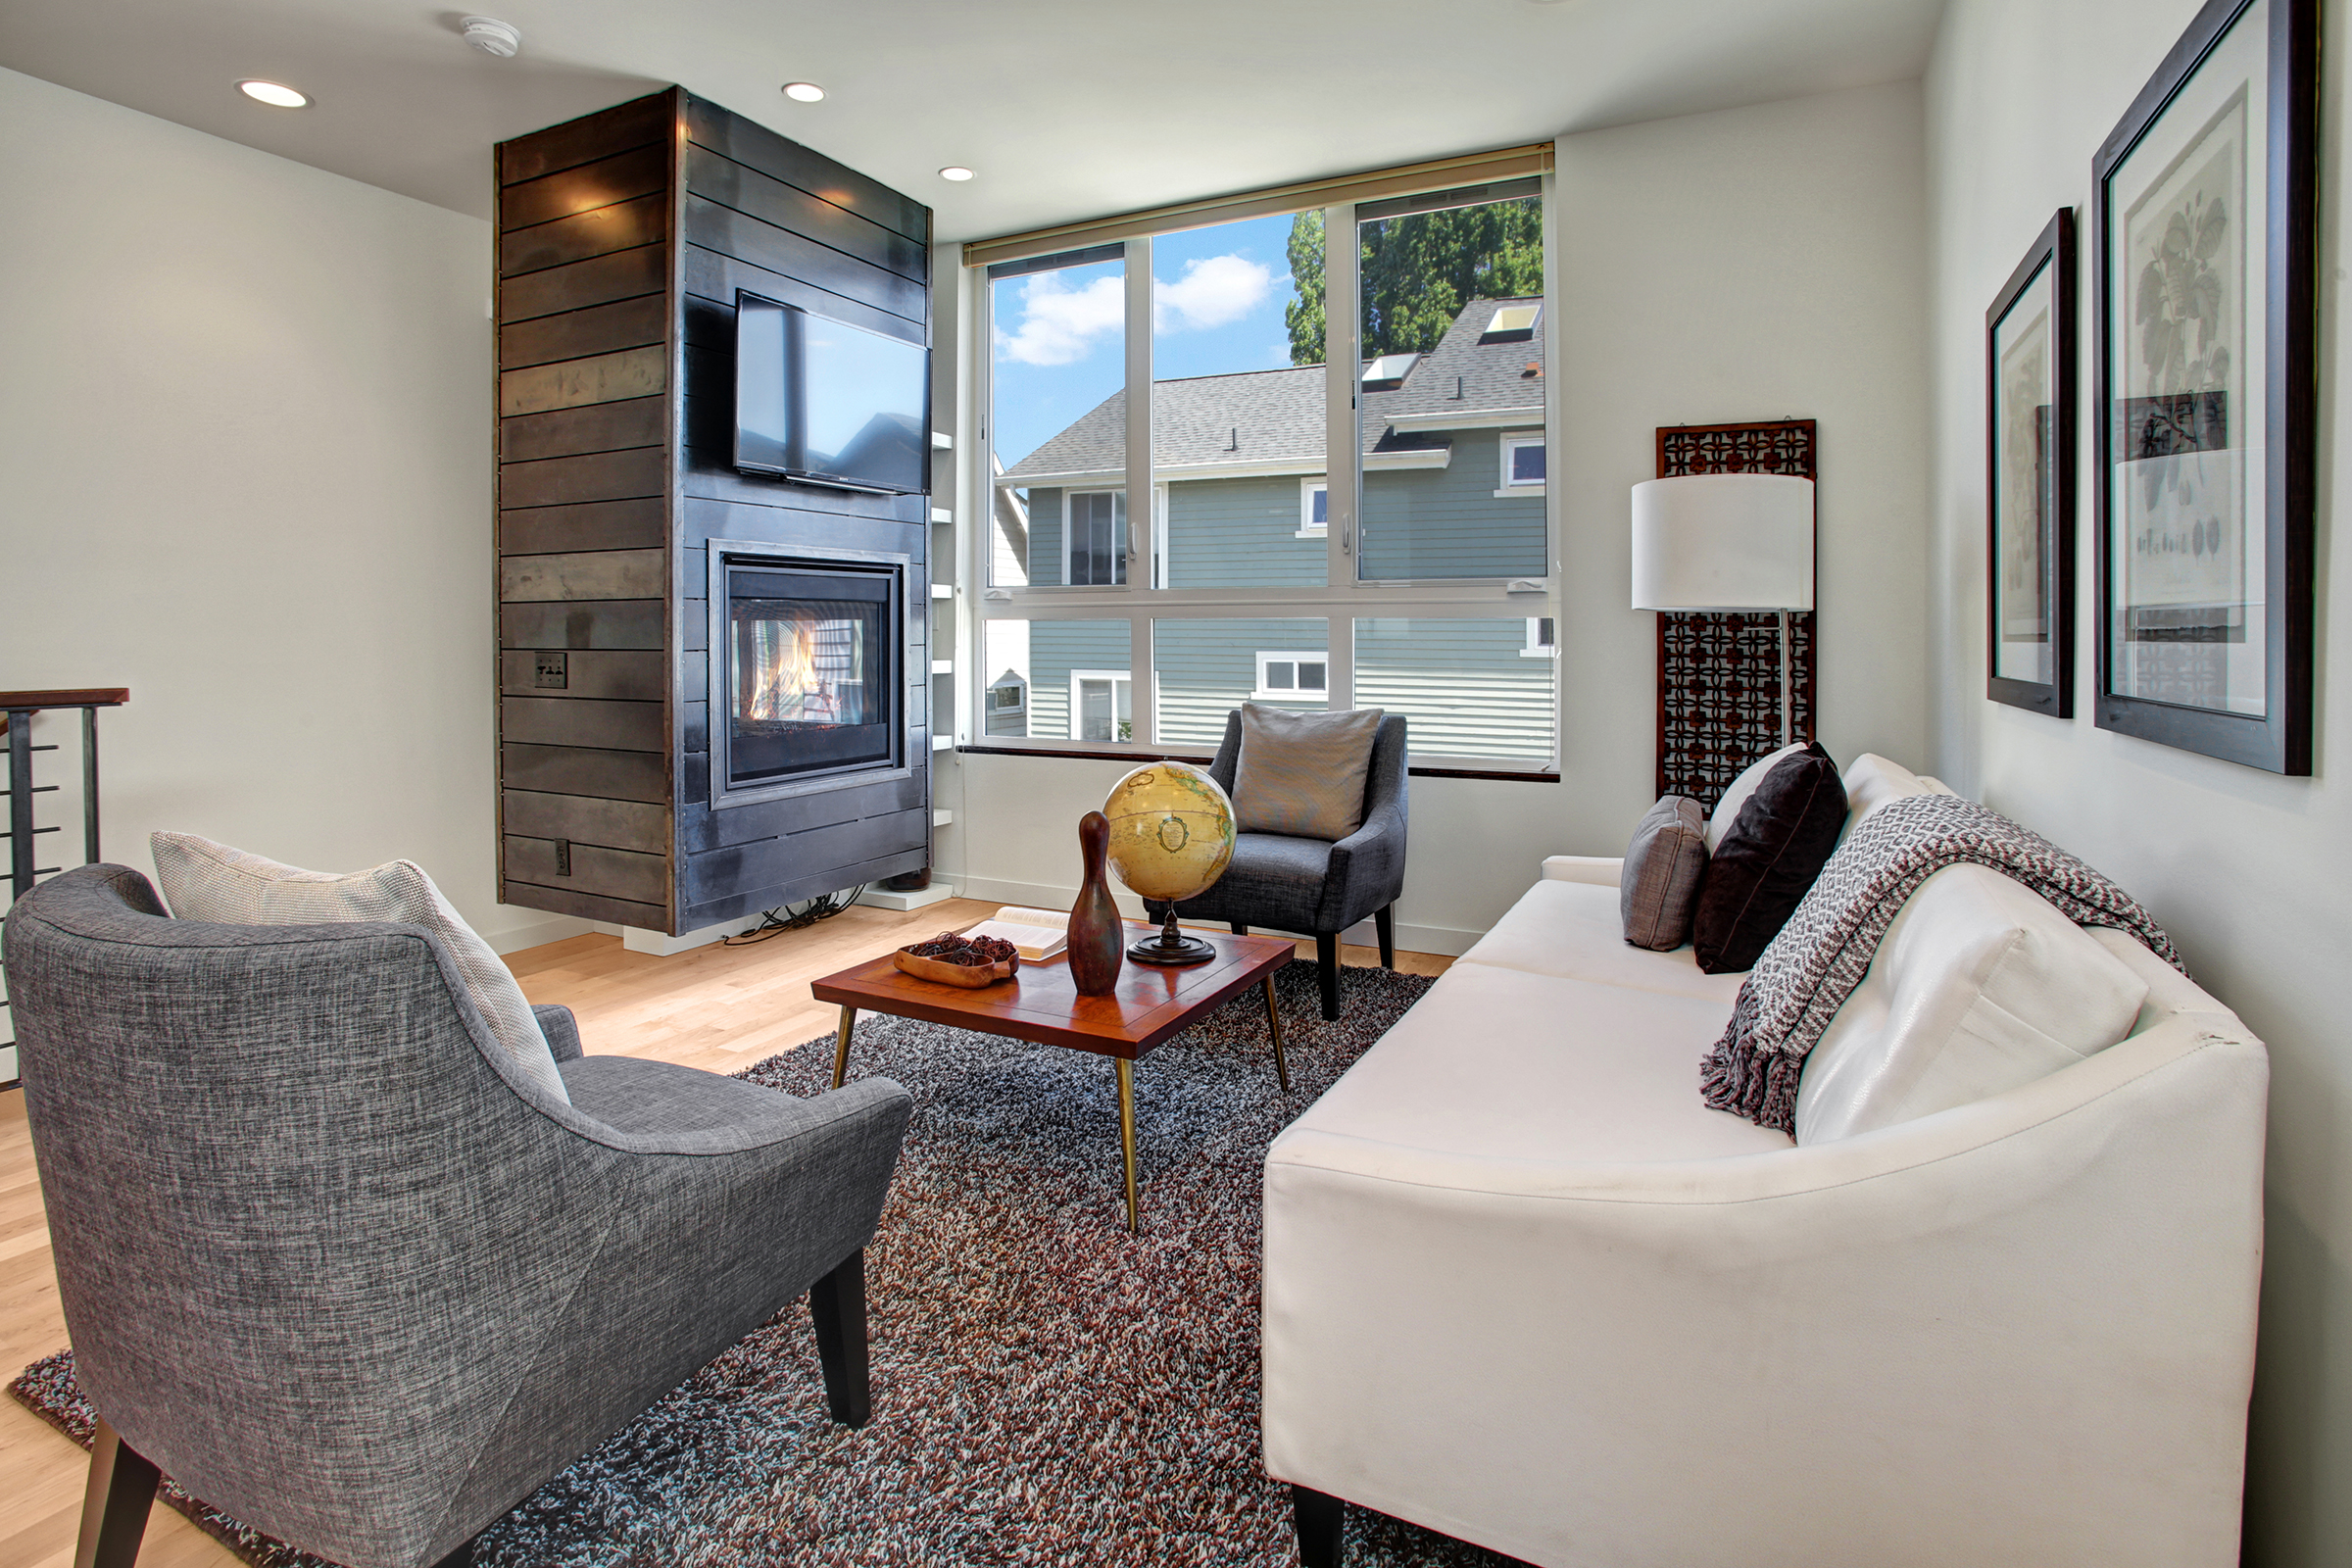 Modern In Magnolia - $627,000